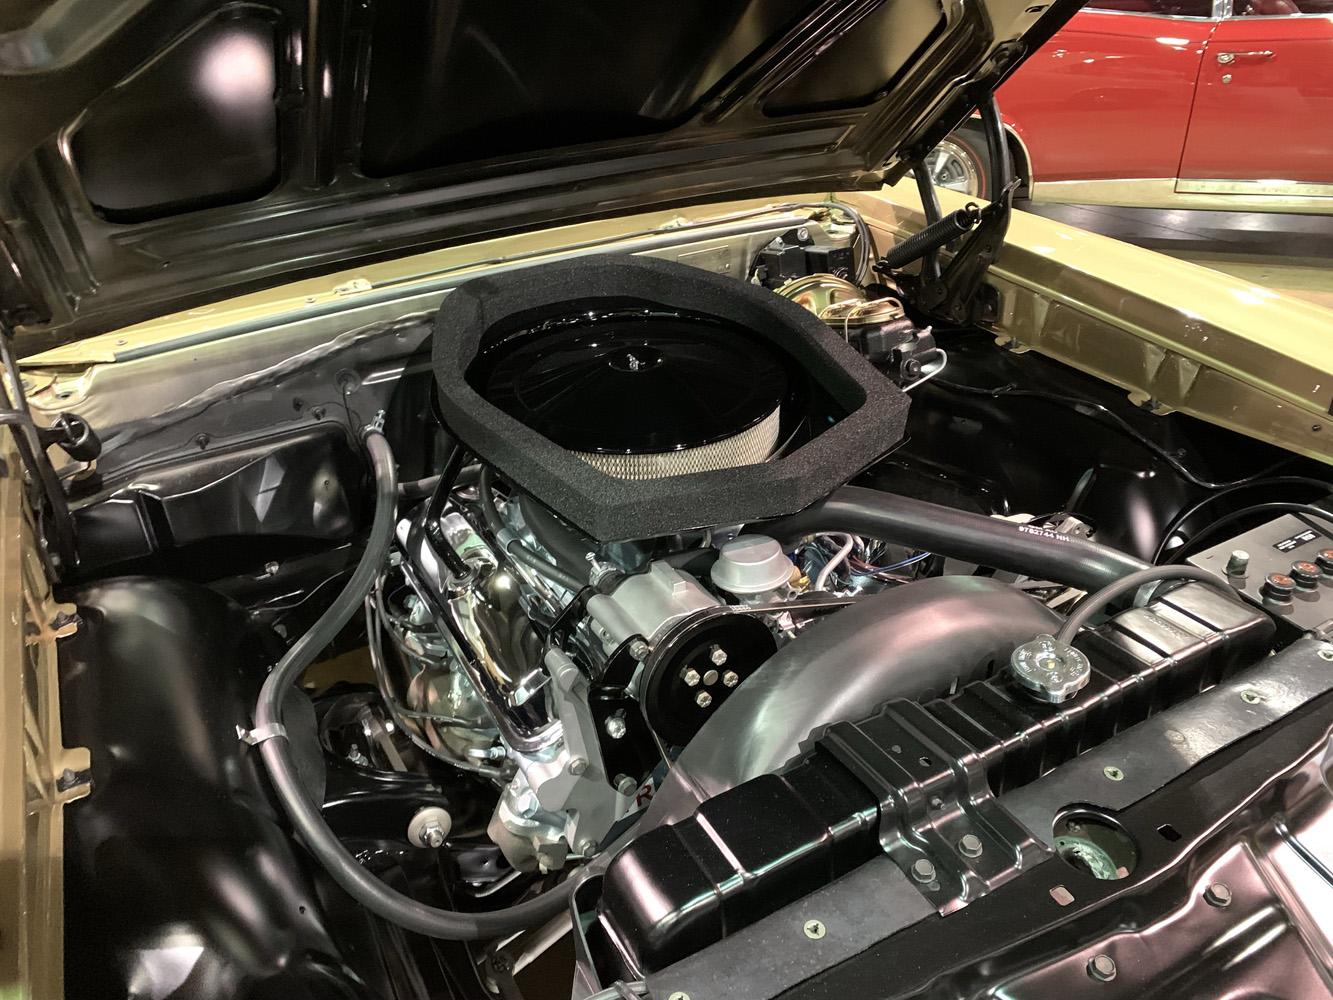 1967 Pontiac Ram Air GTO engine